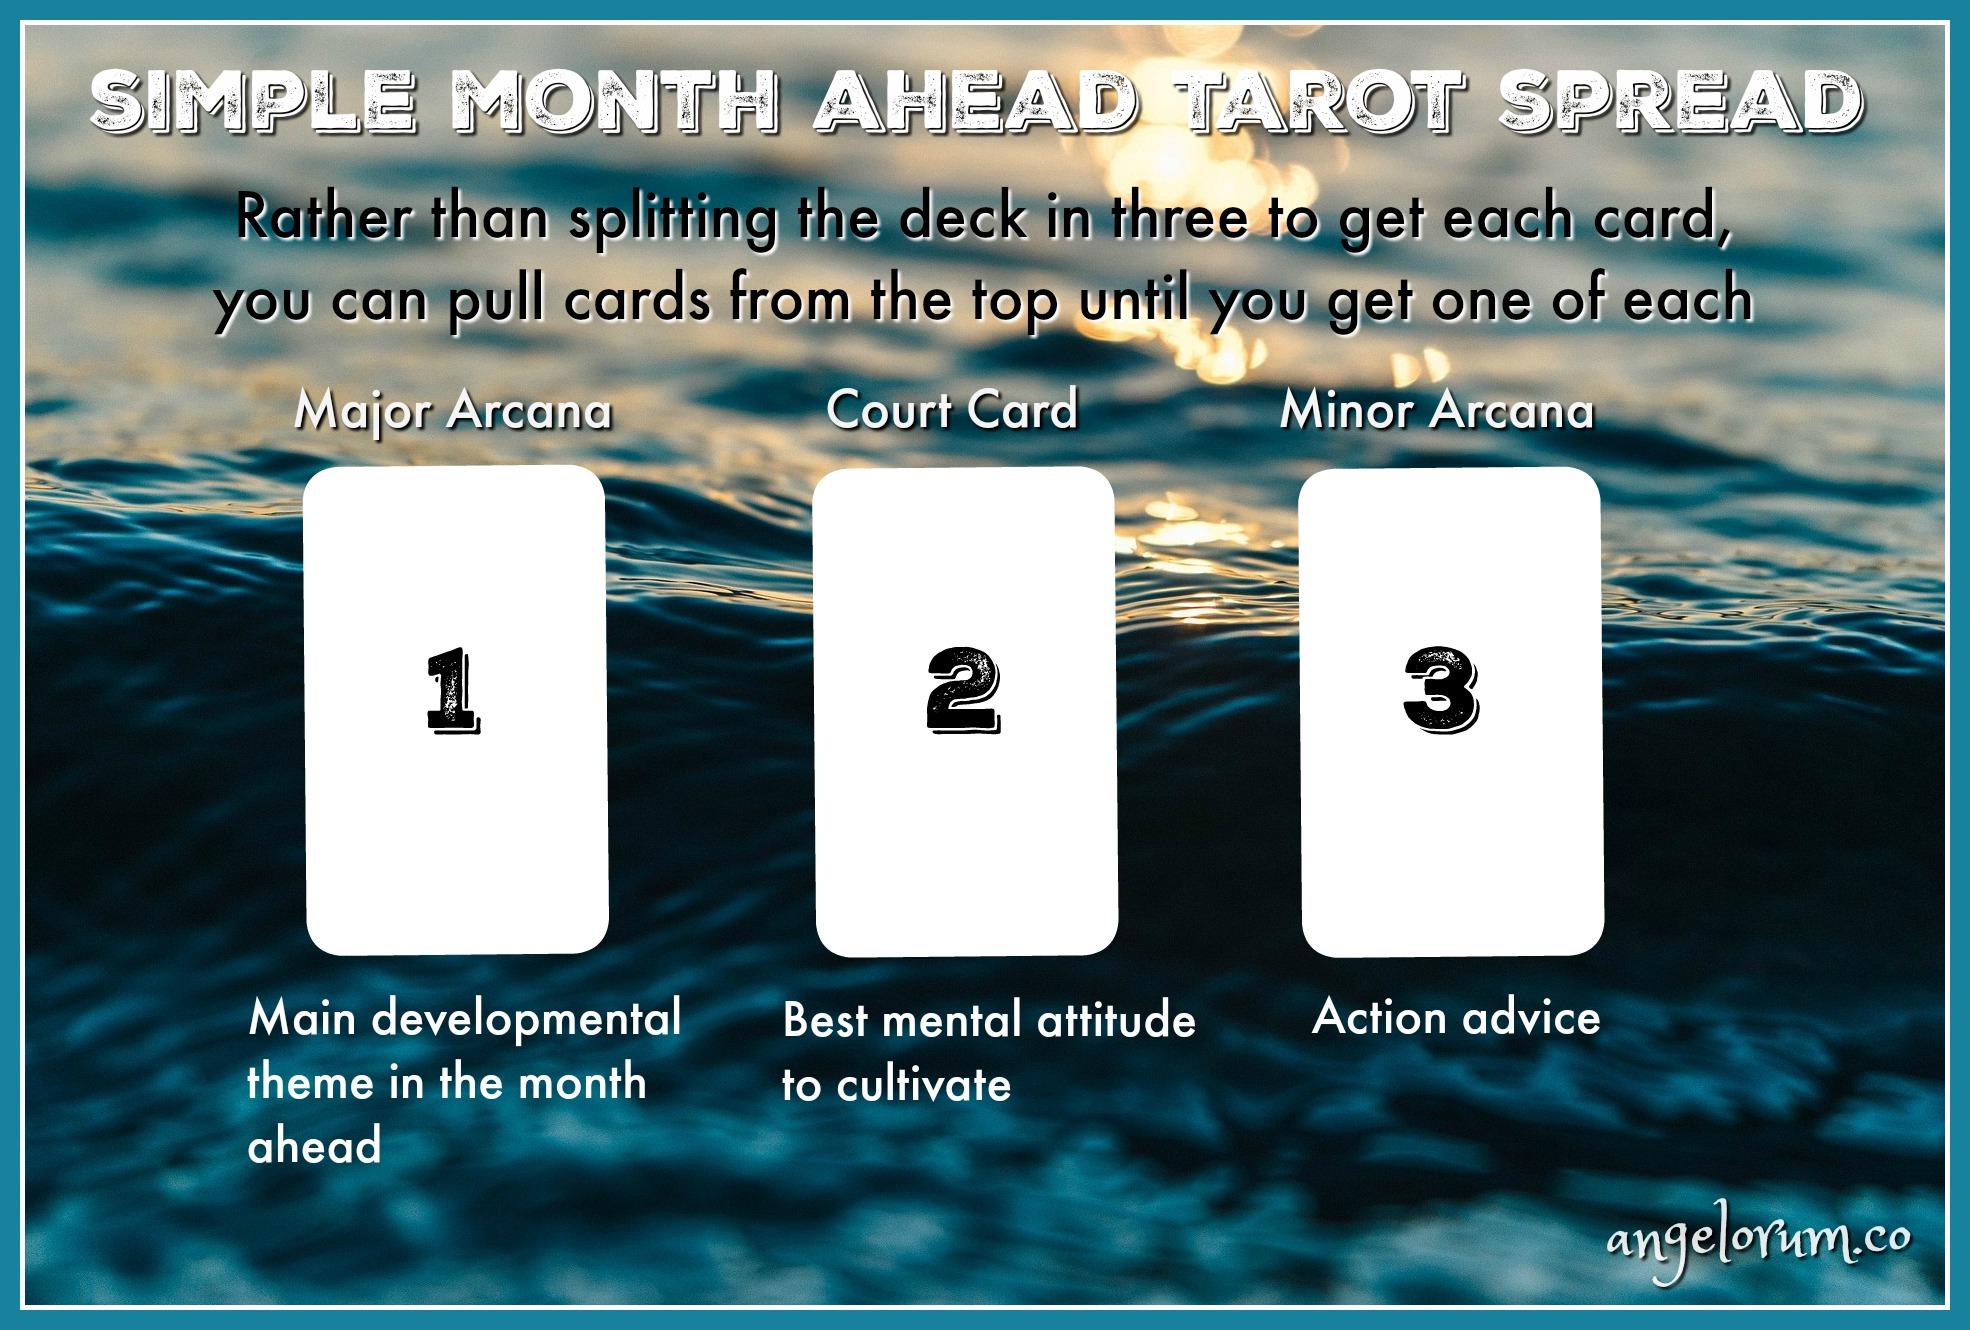 simple month ahead tarot spread